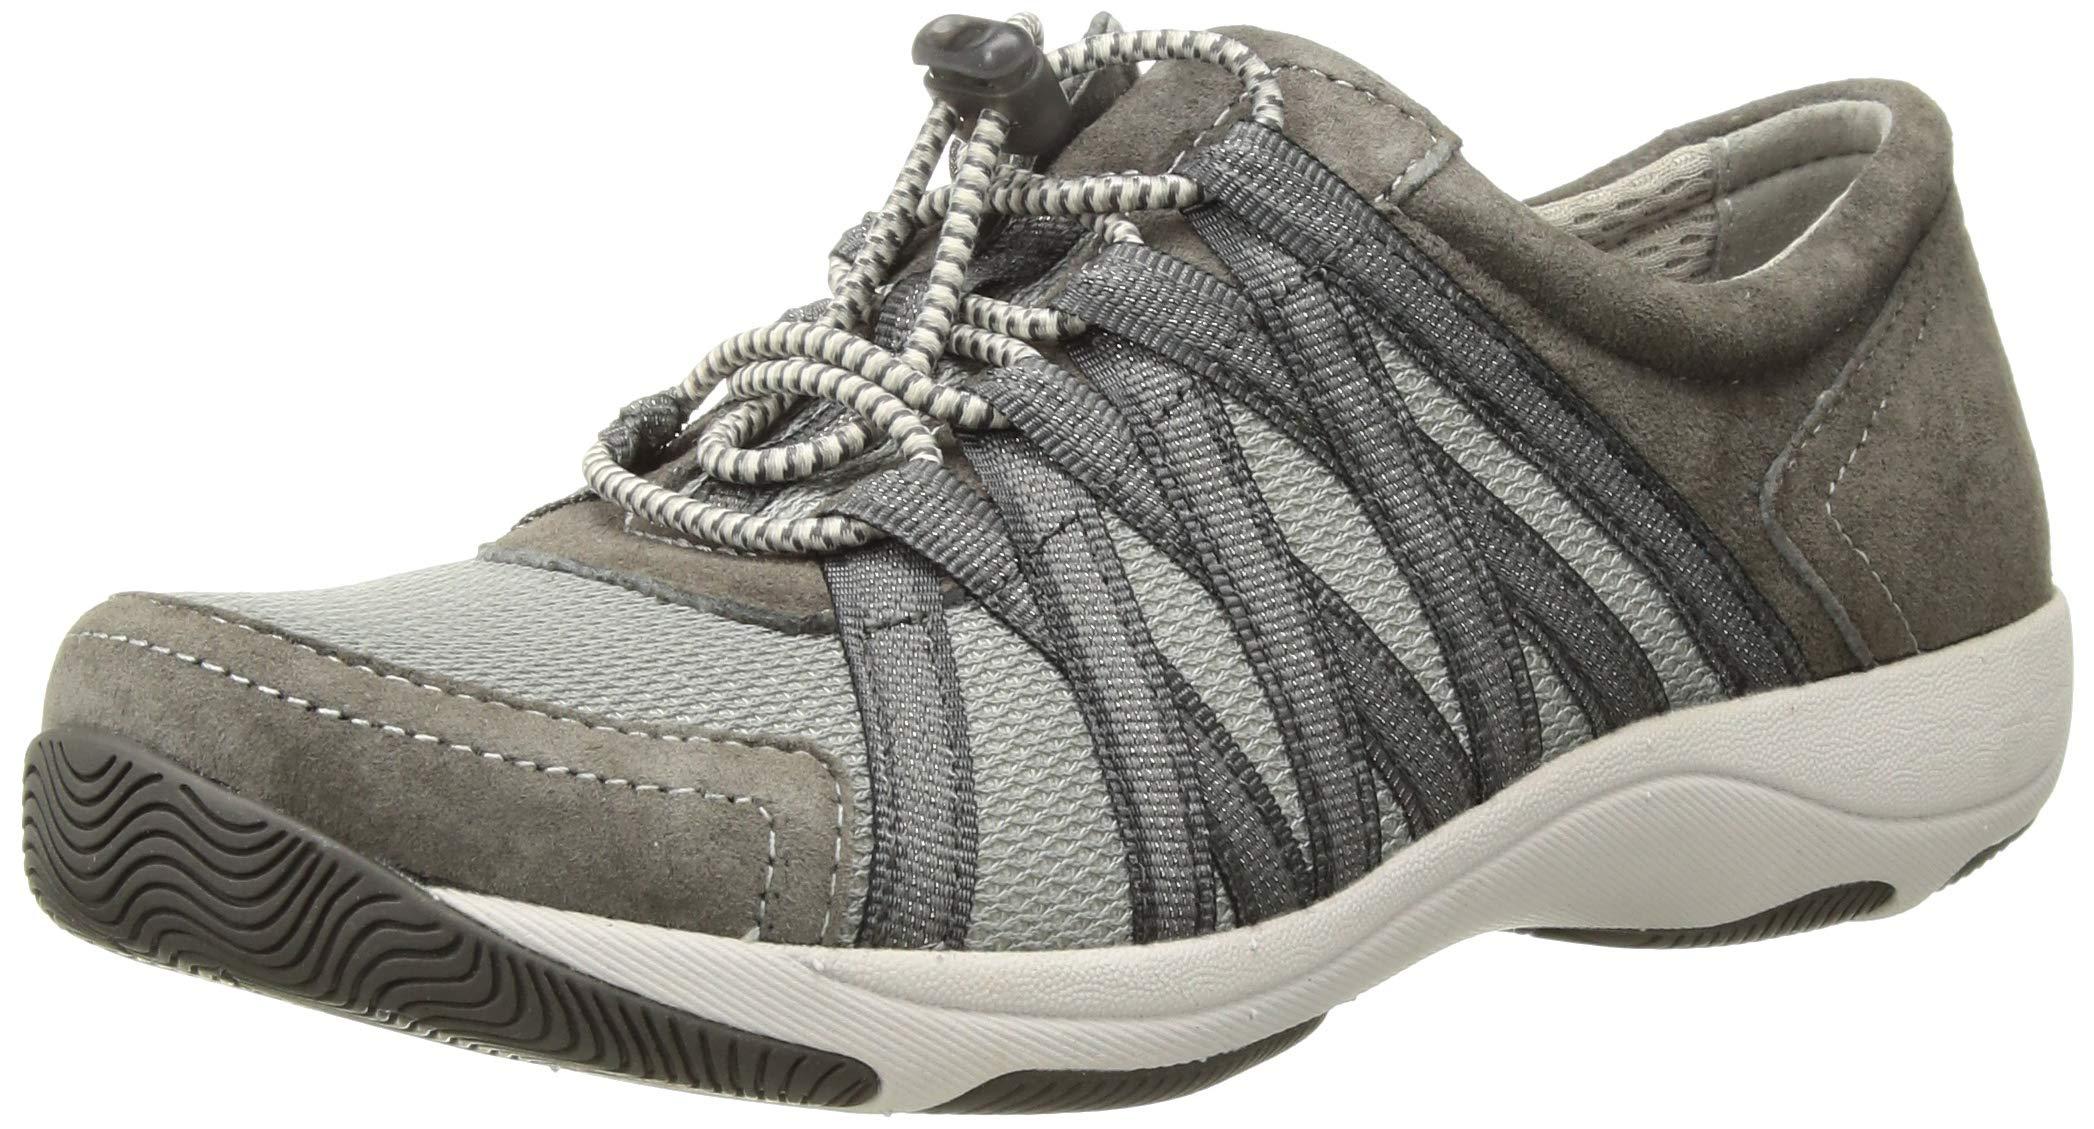 Dansko Women's Honor Fashion Sneaker, Charcoal Suede, 40 EU/9.5-10 M US